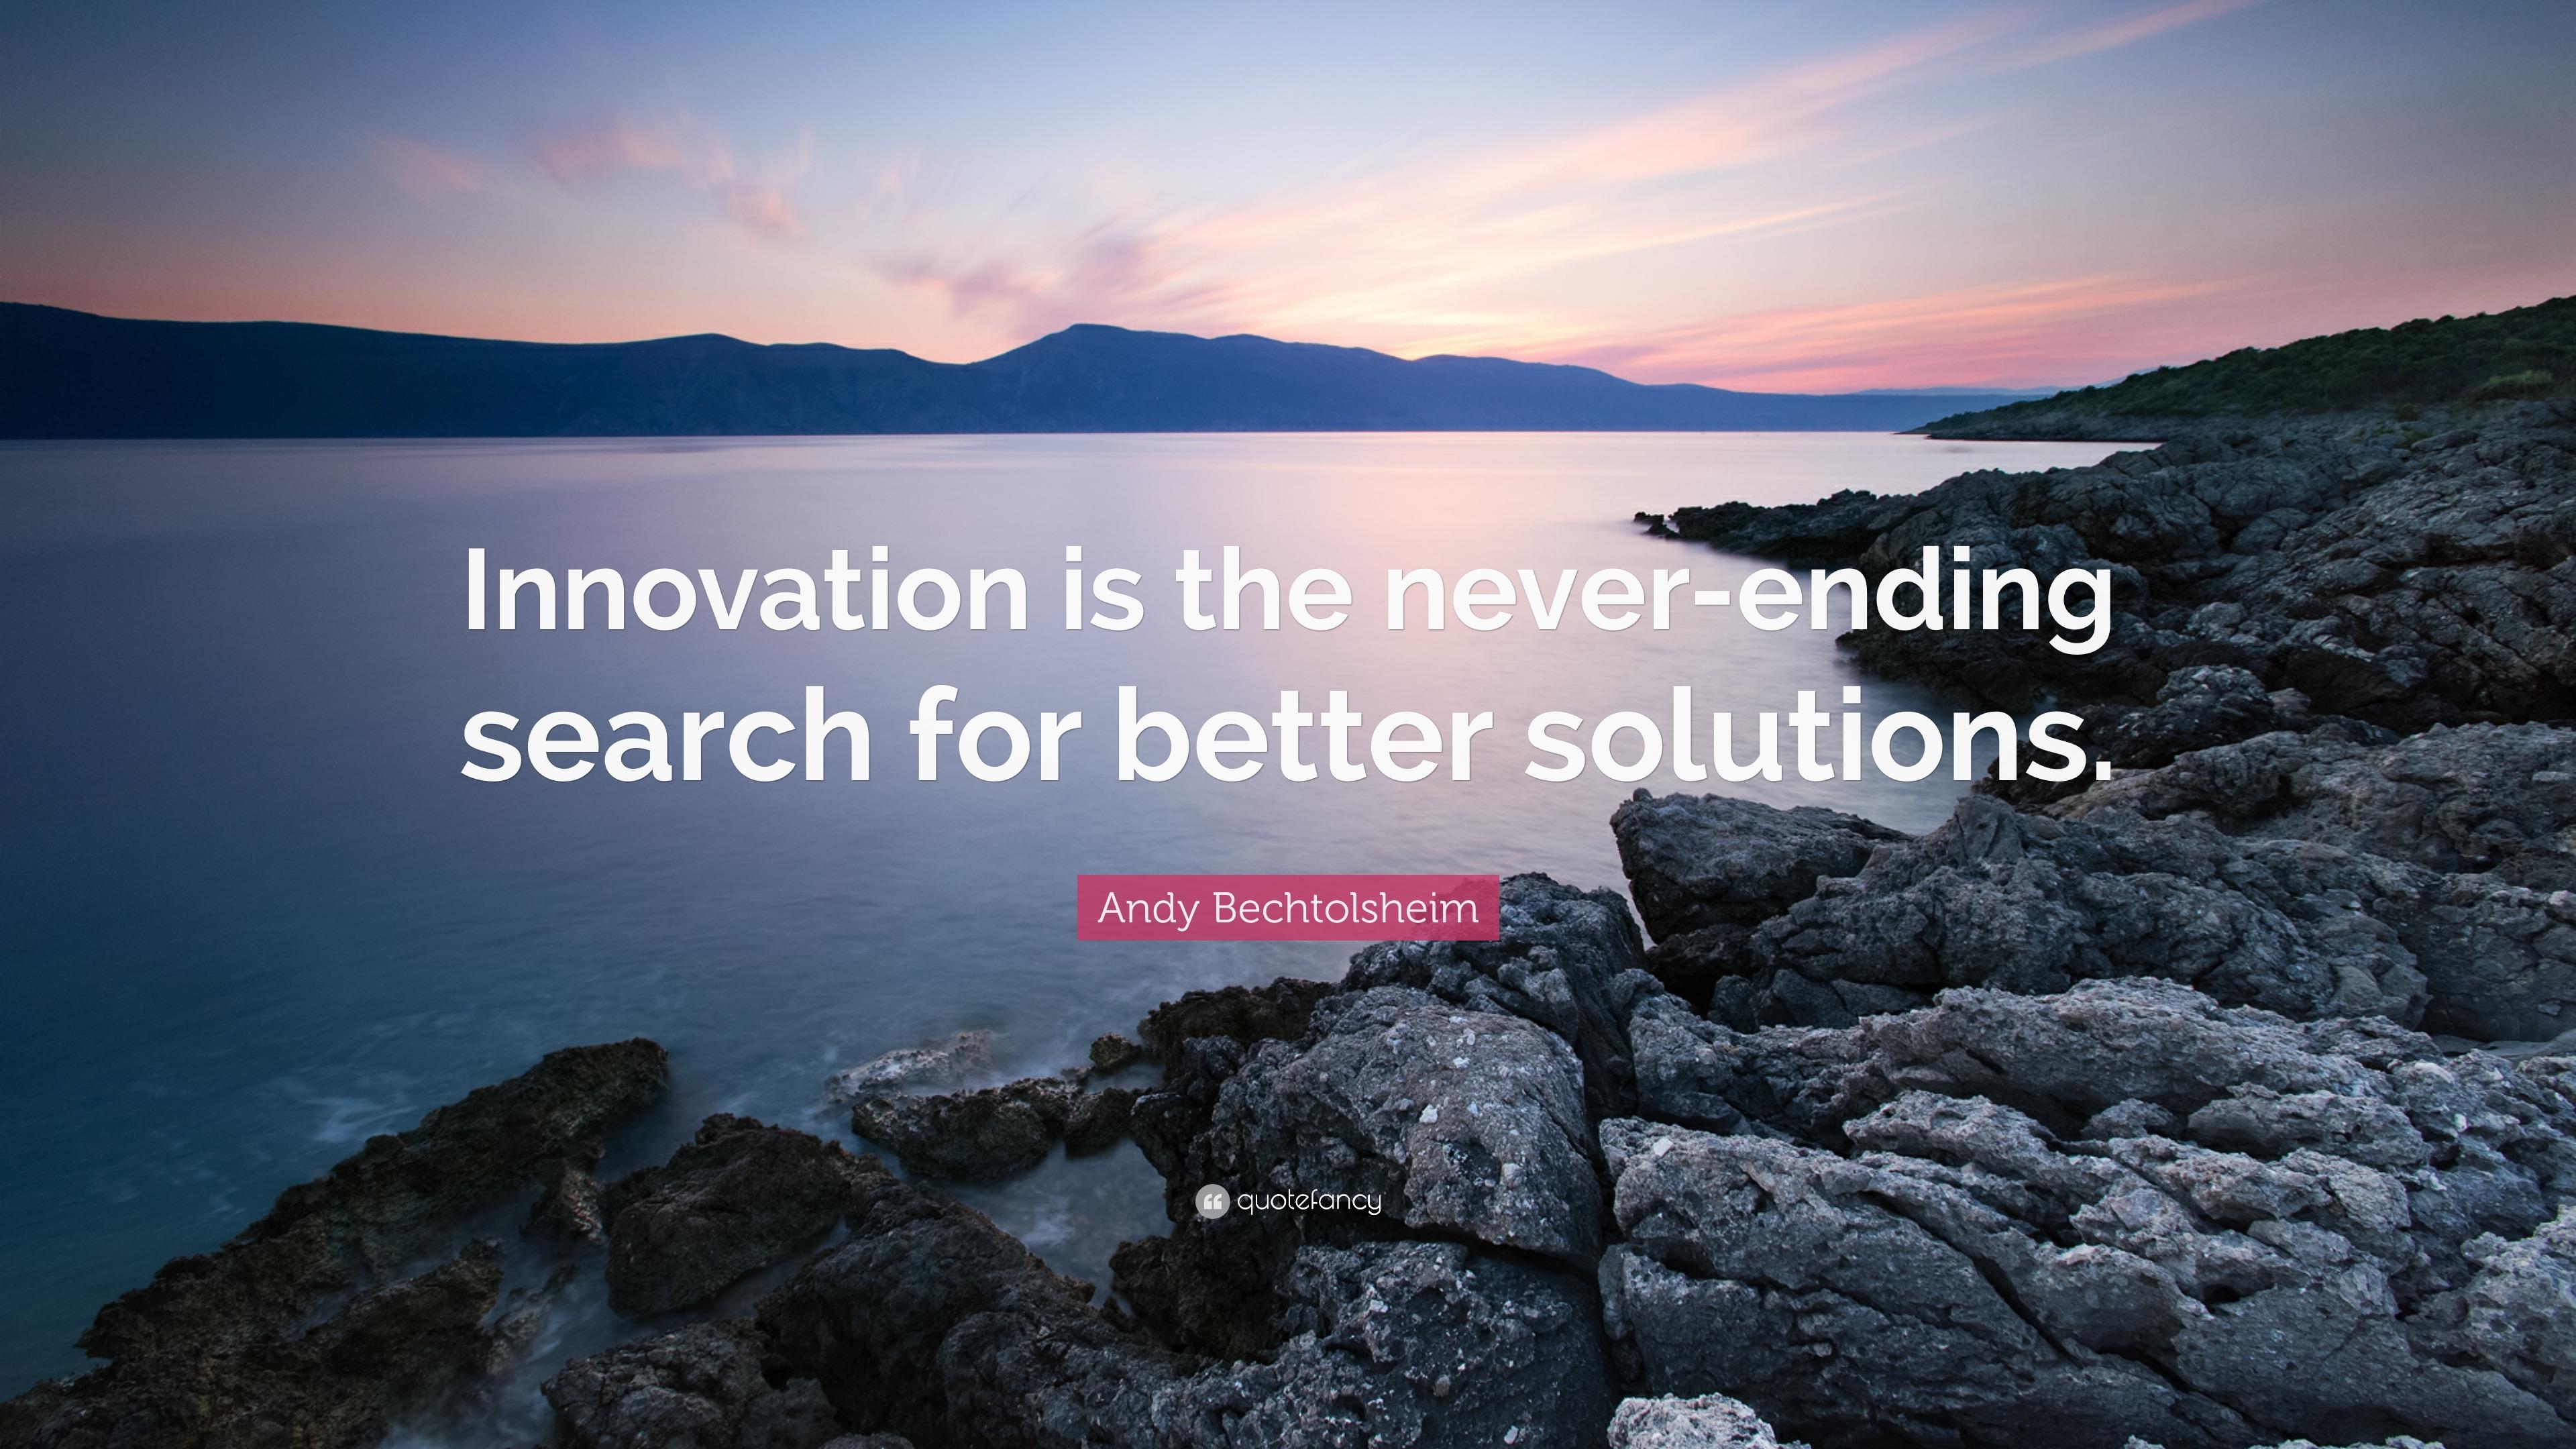 Andy Bechtolsheim Quotes 3 Wallpapers Quotefancy